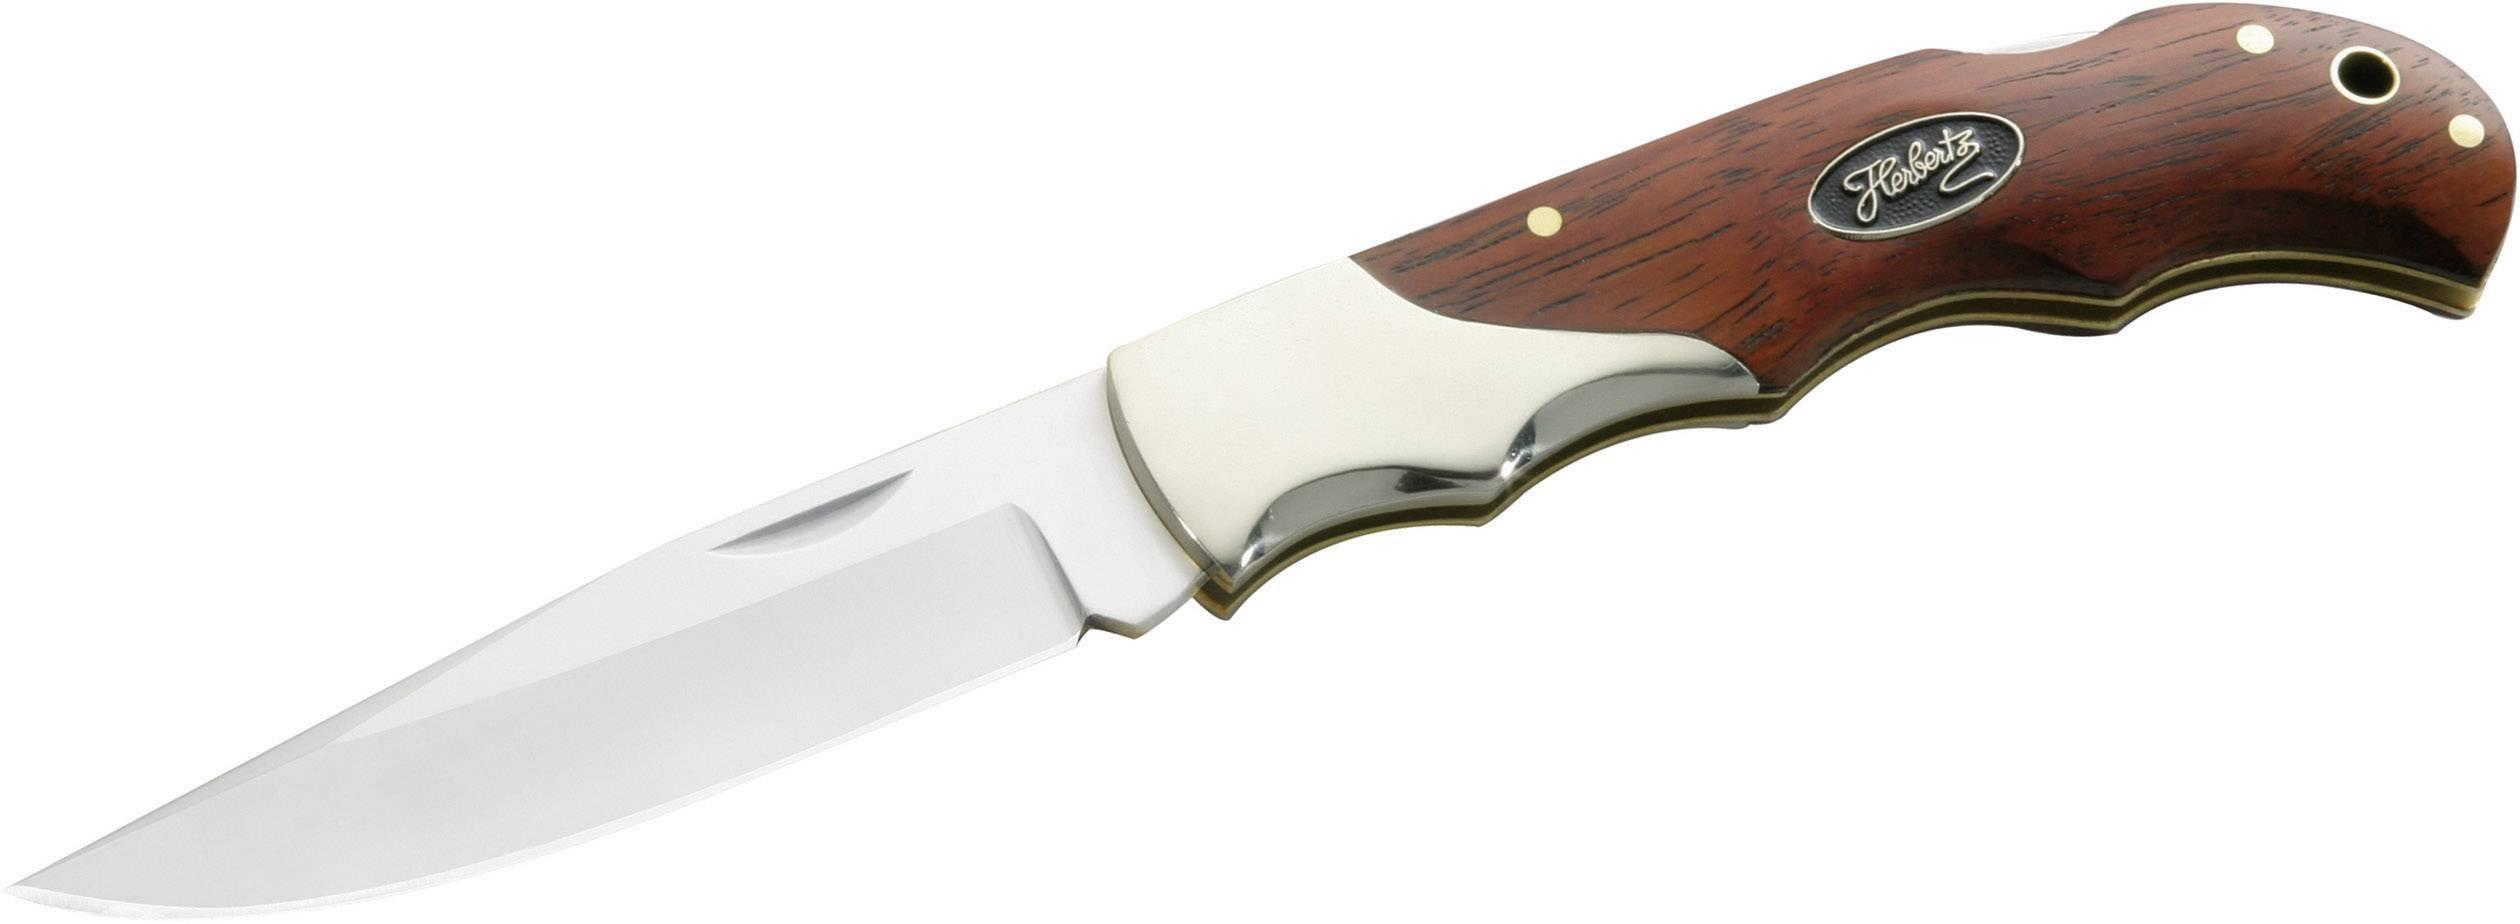 Datovania opinel nože